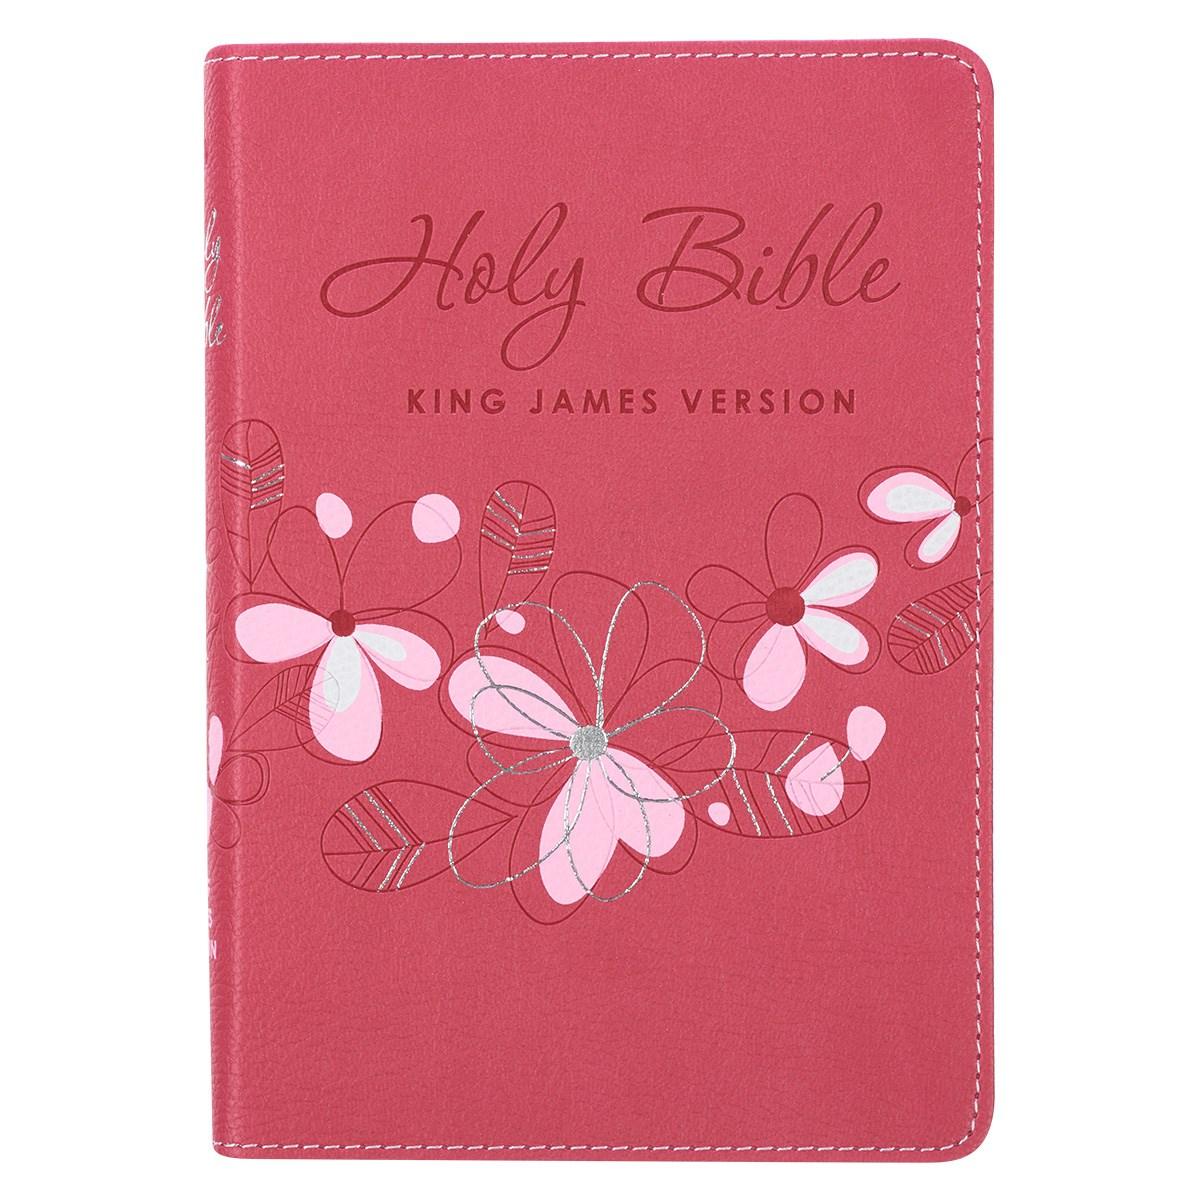 KJV Compact Bible-Pink LuxLeather